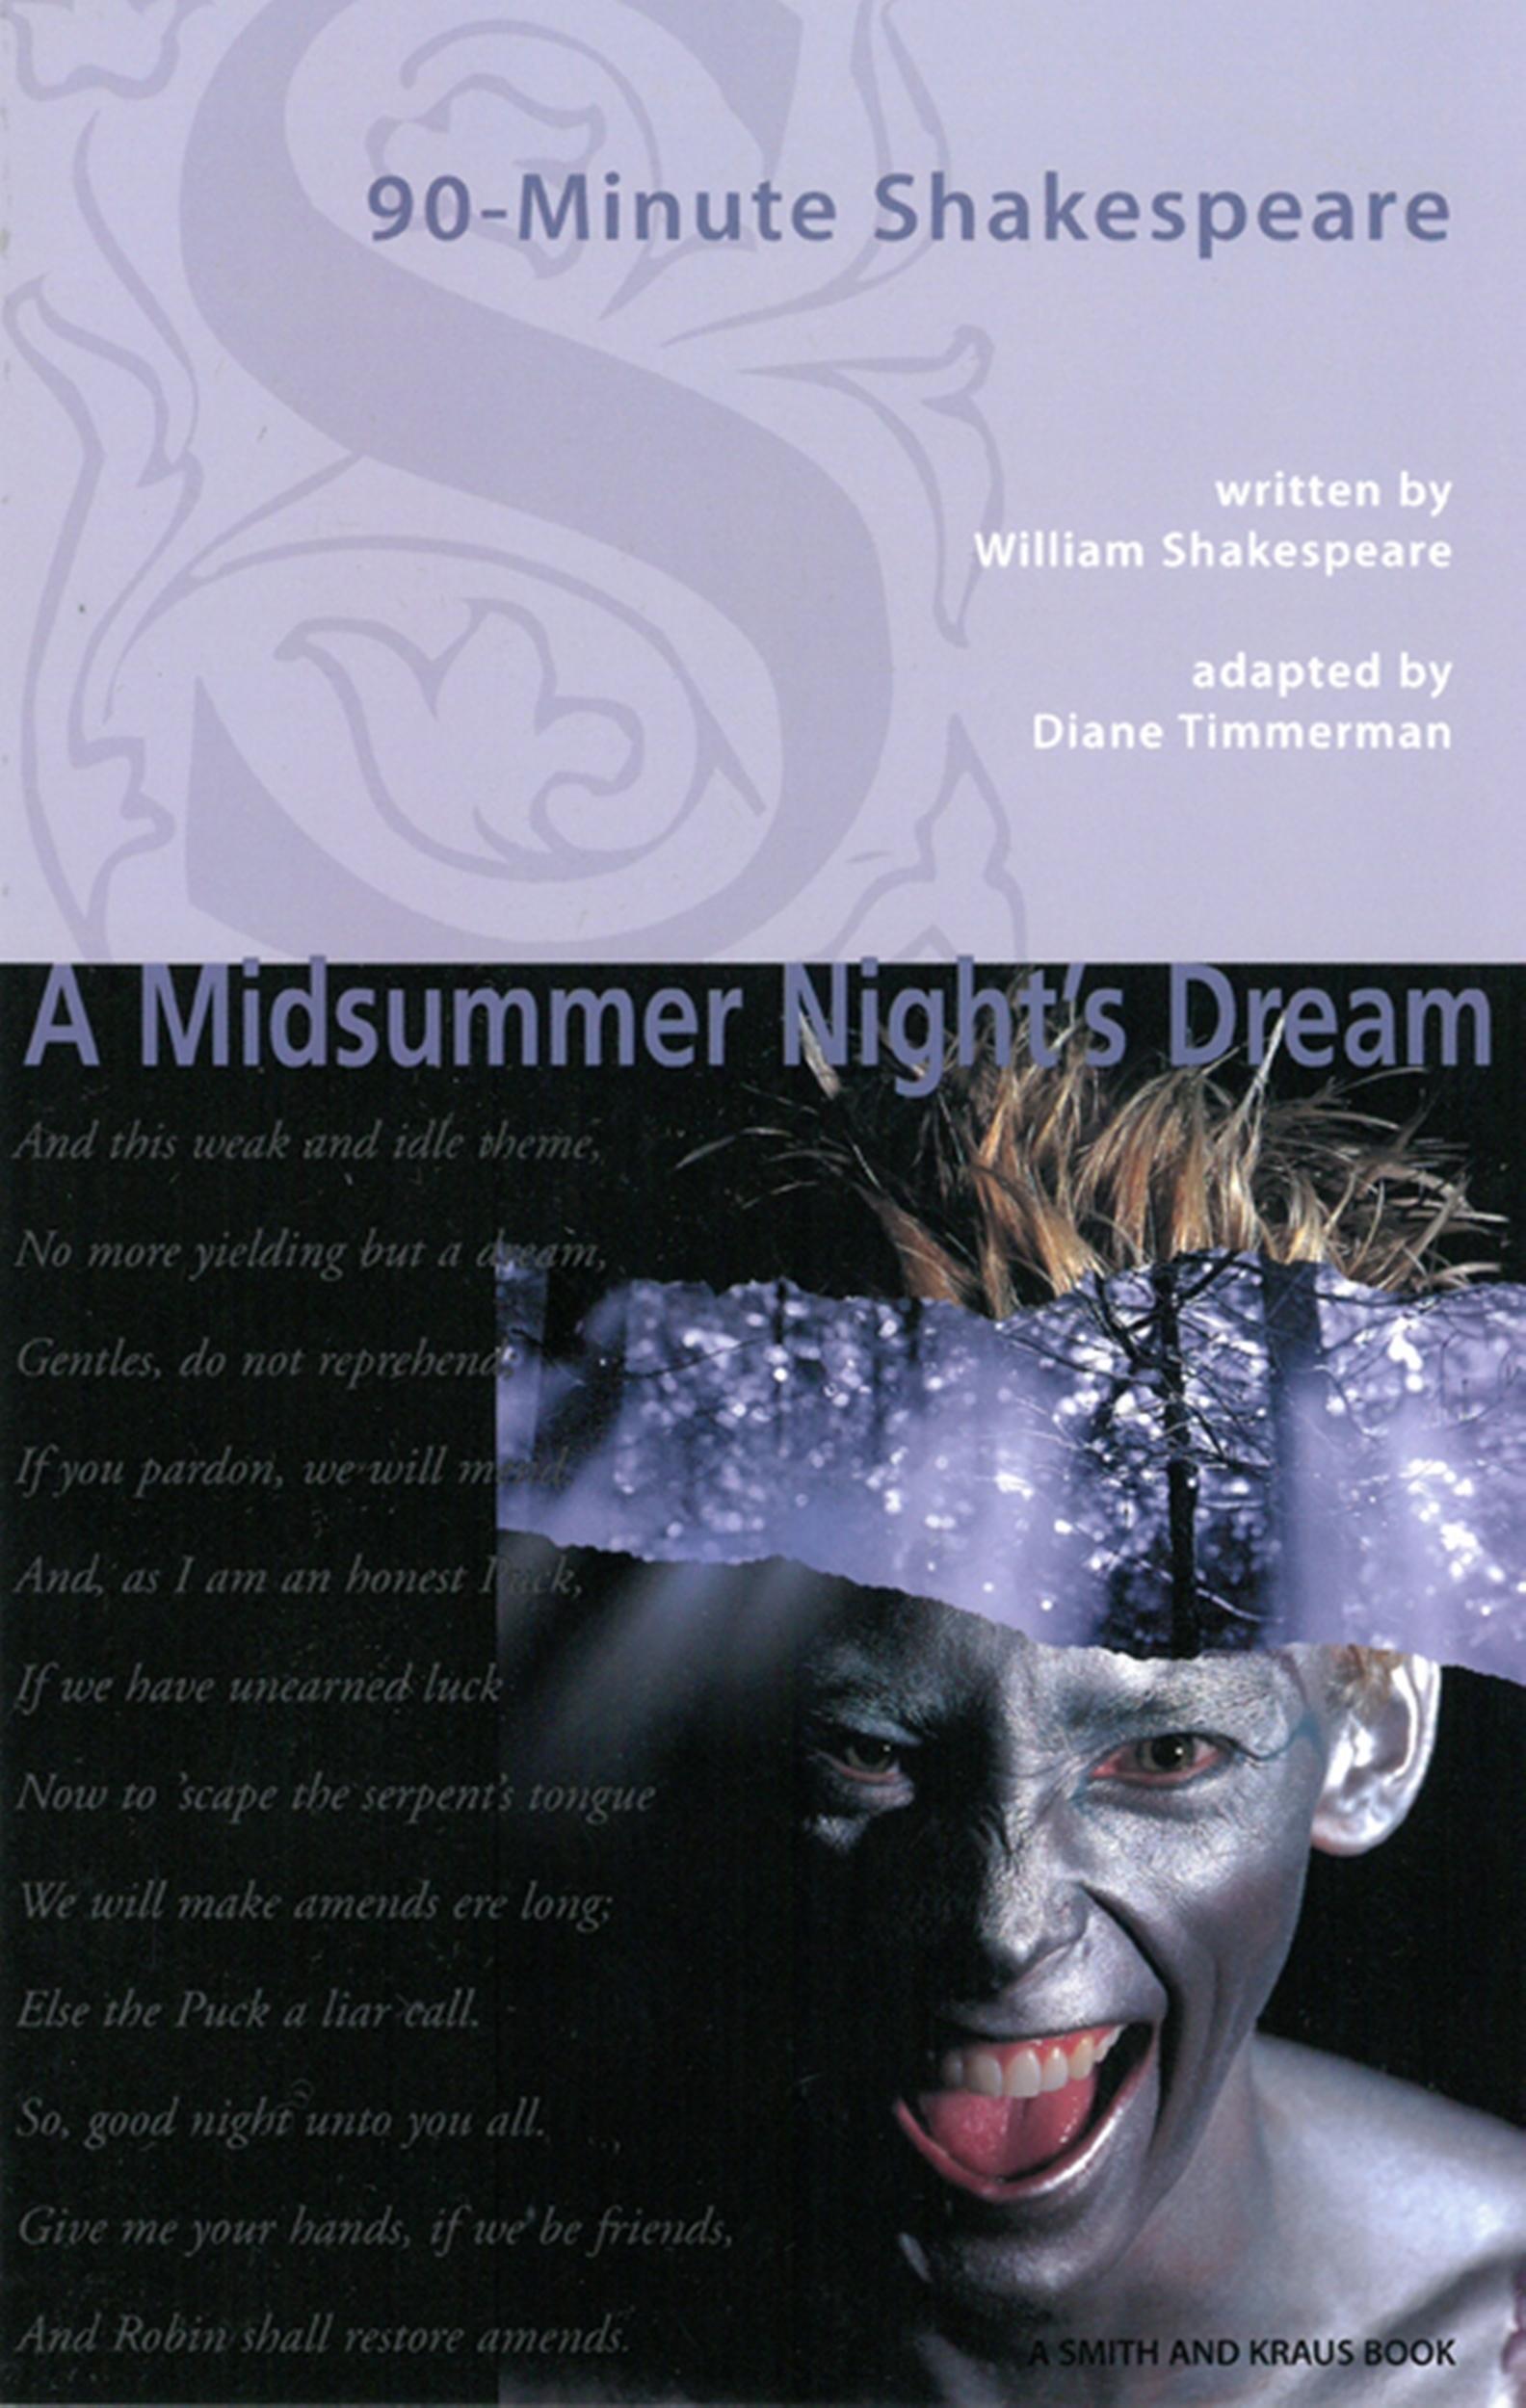 90-Minute Shakespeare: A Midsummer's Night Dream